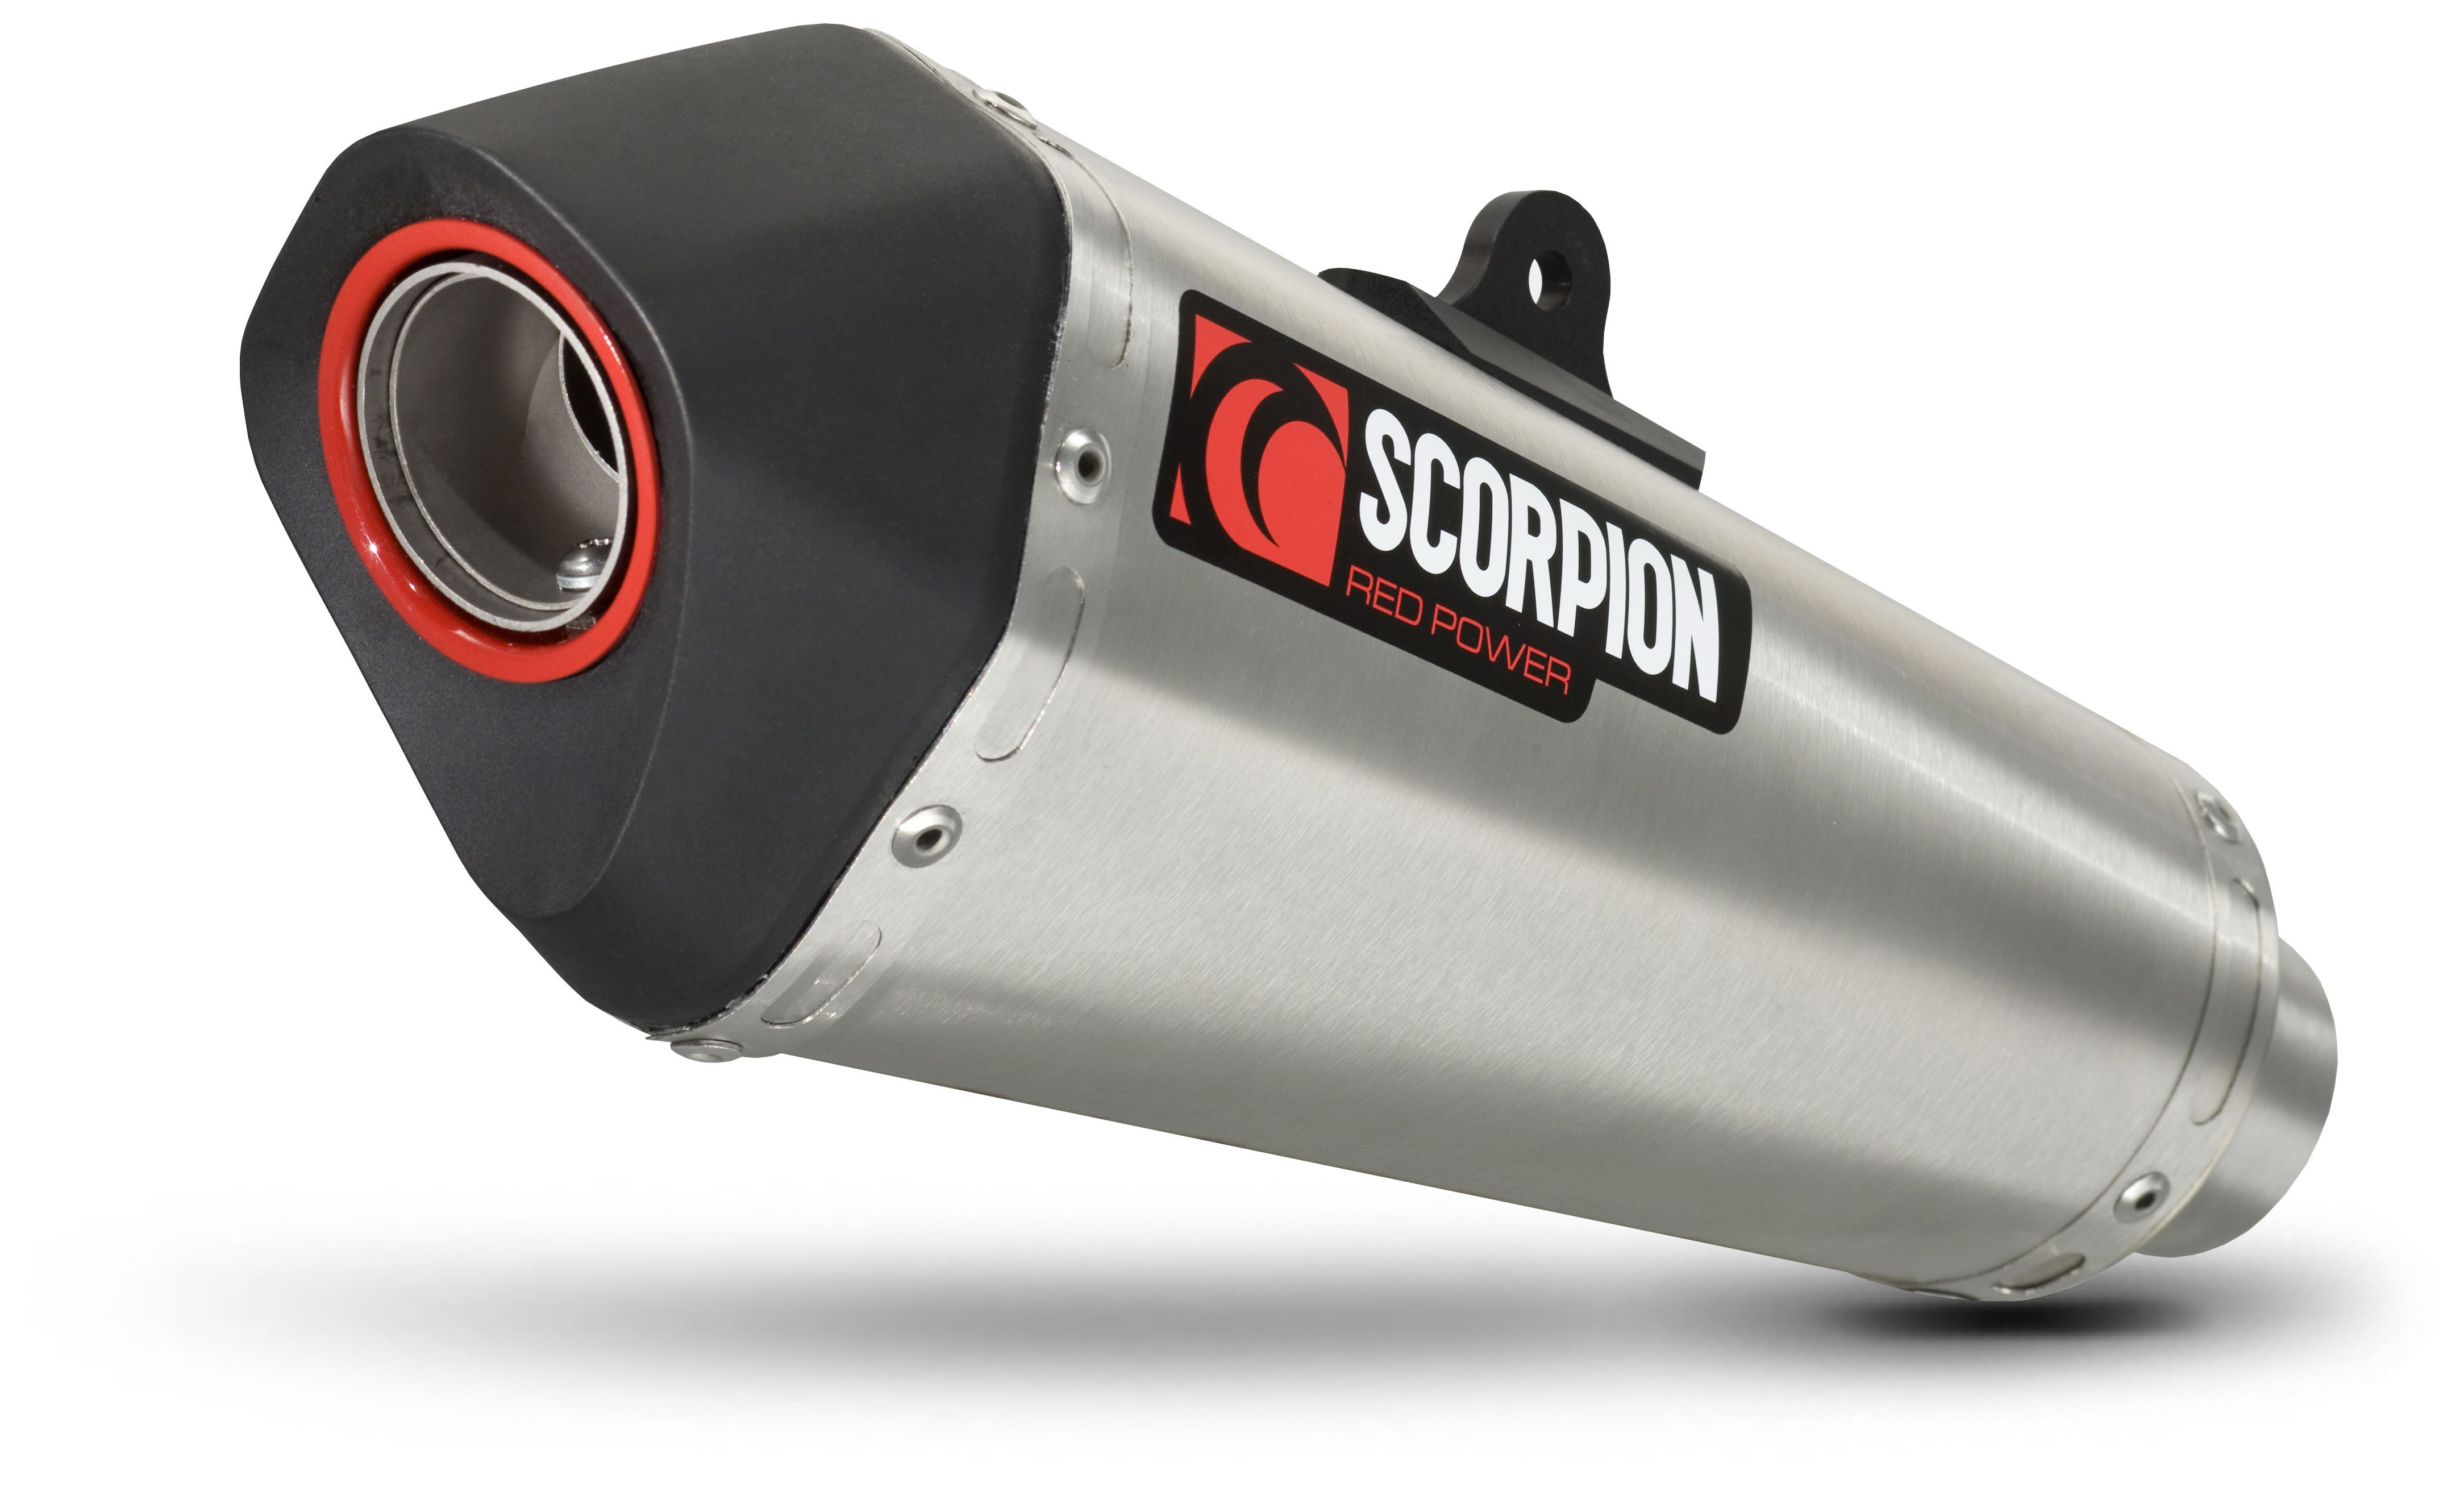 Scorpion Serket Taper Exhaust System Kawasaki Versys 650 2015 2019 2014 Ninja 300 Engine Diagram 10 8490 Off Revzilla